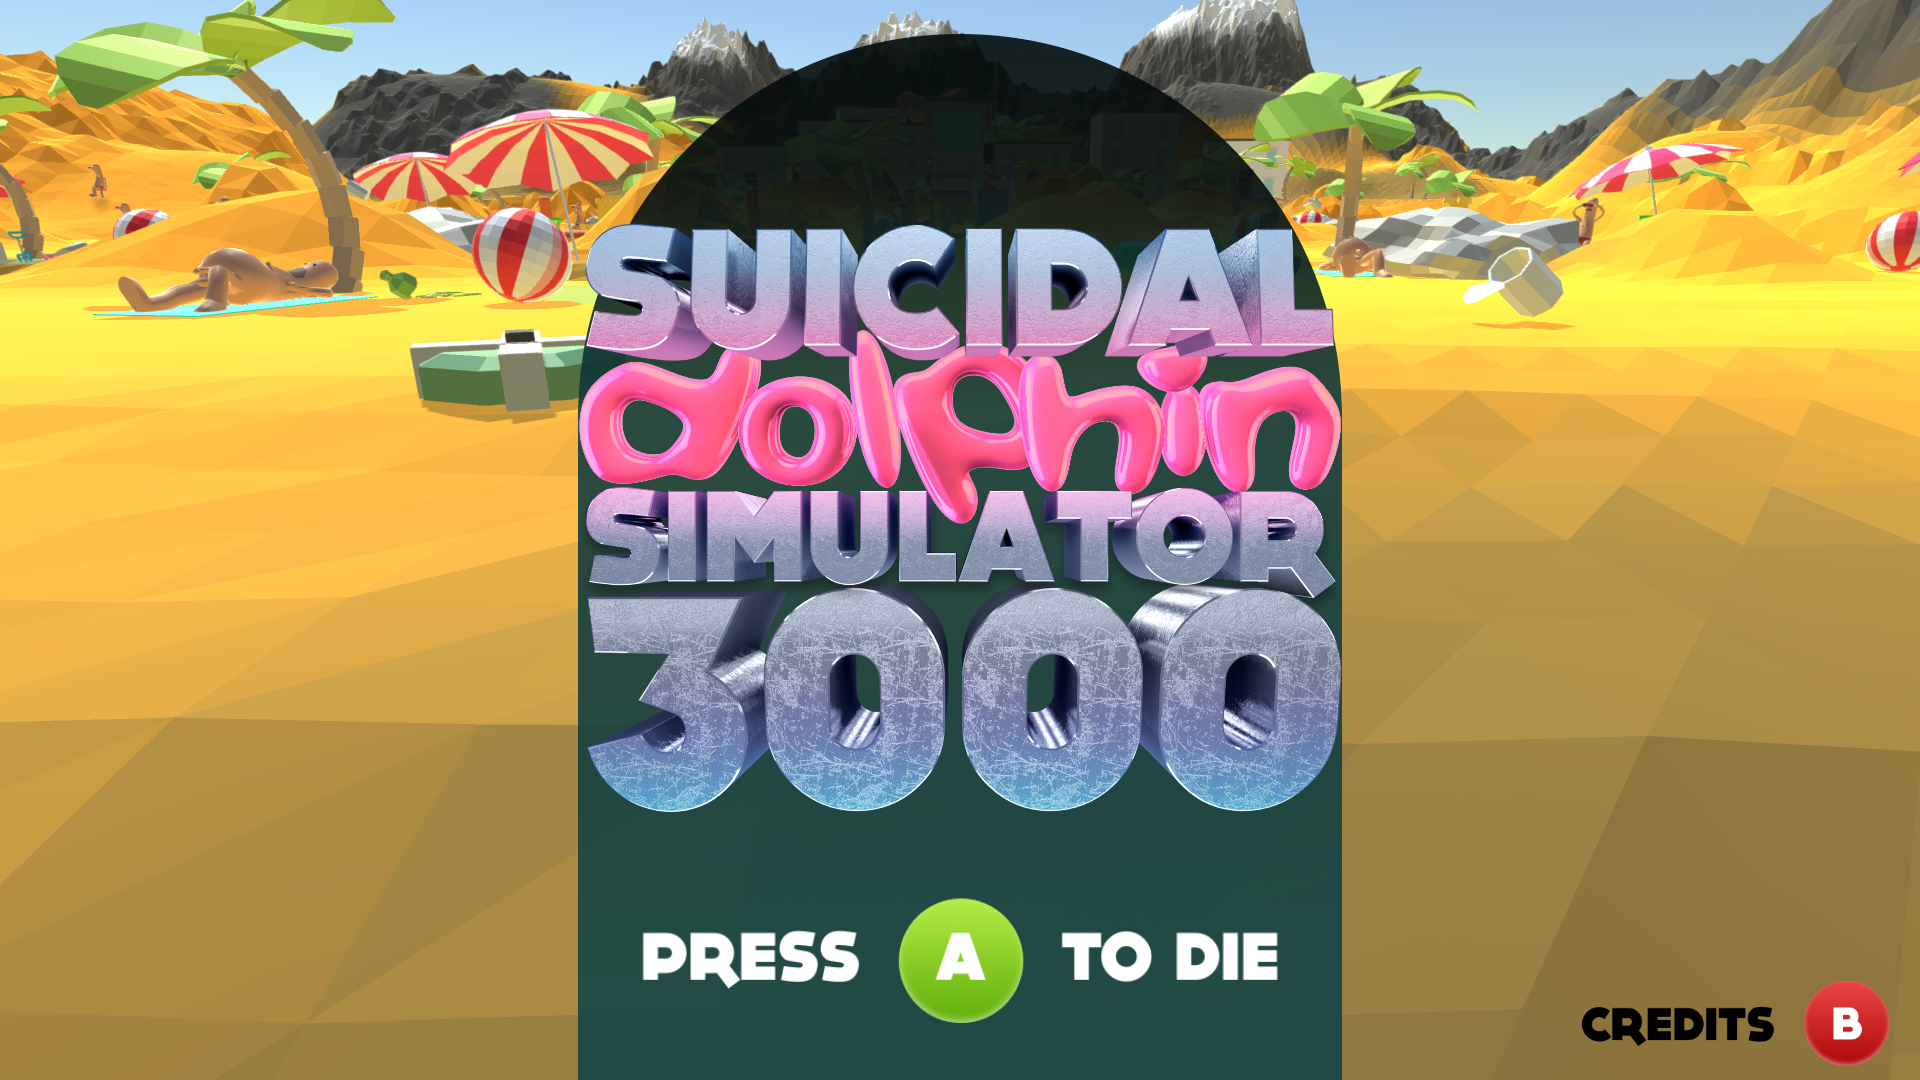 Suicidal Dolphin Simulator 3000